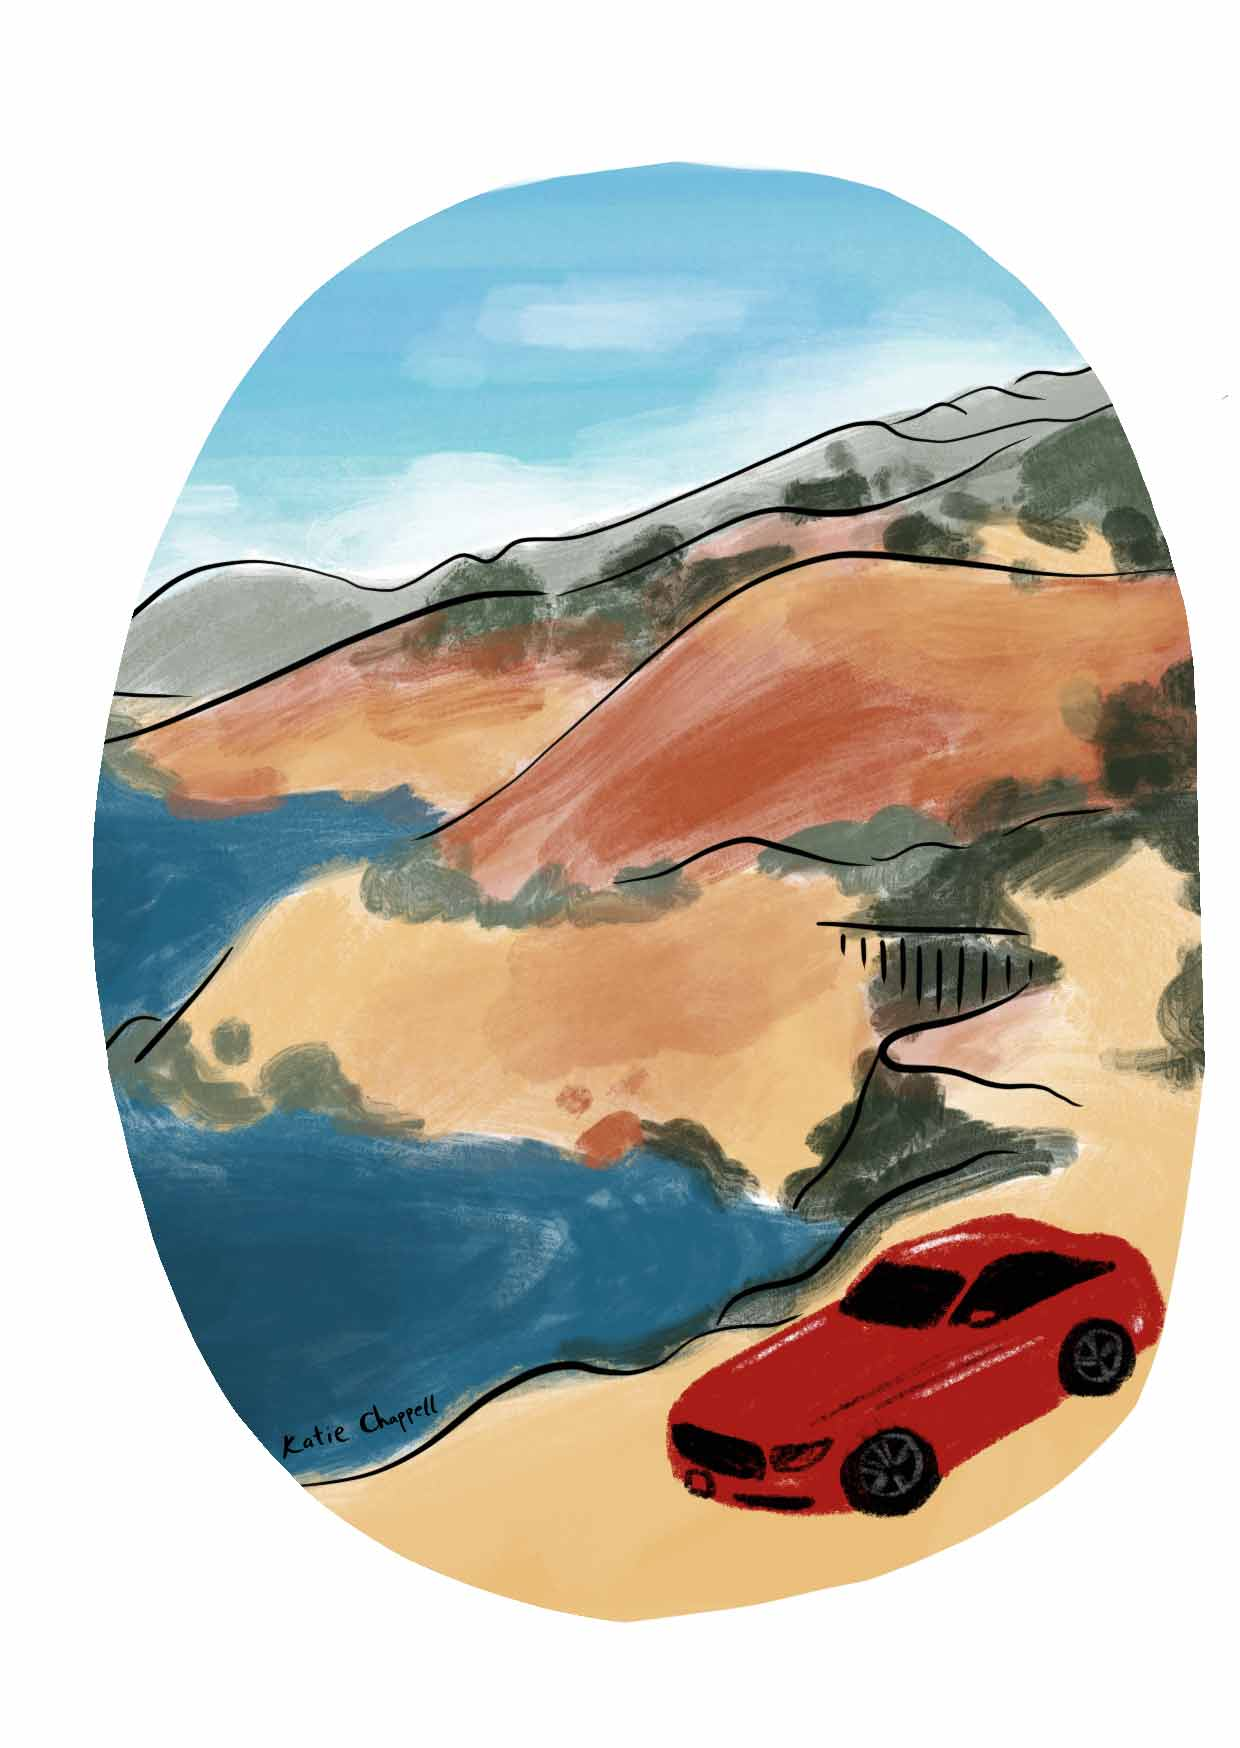 California-illustration-edinburgh-katie-chappell.jpg